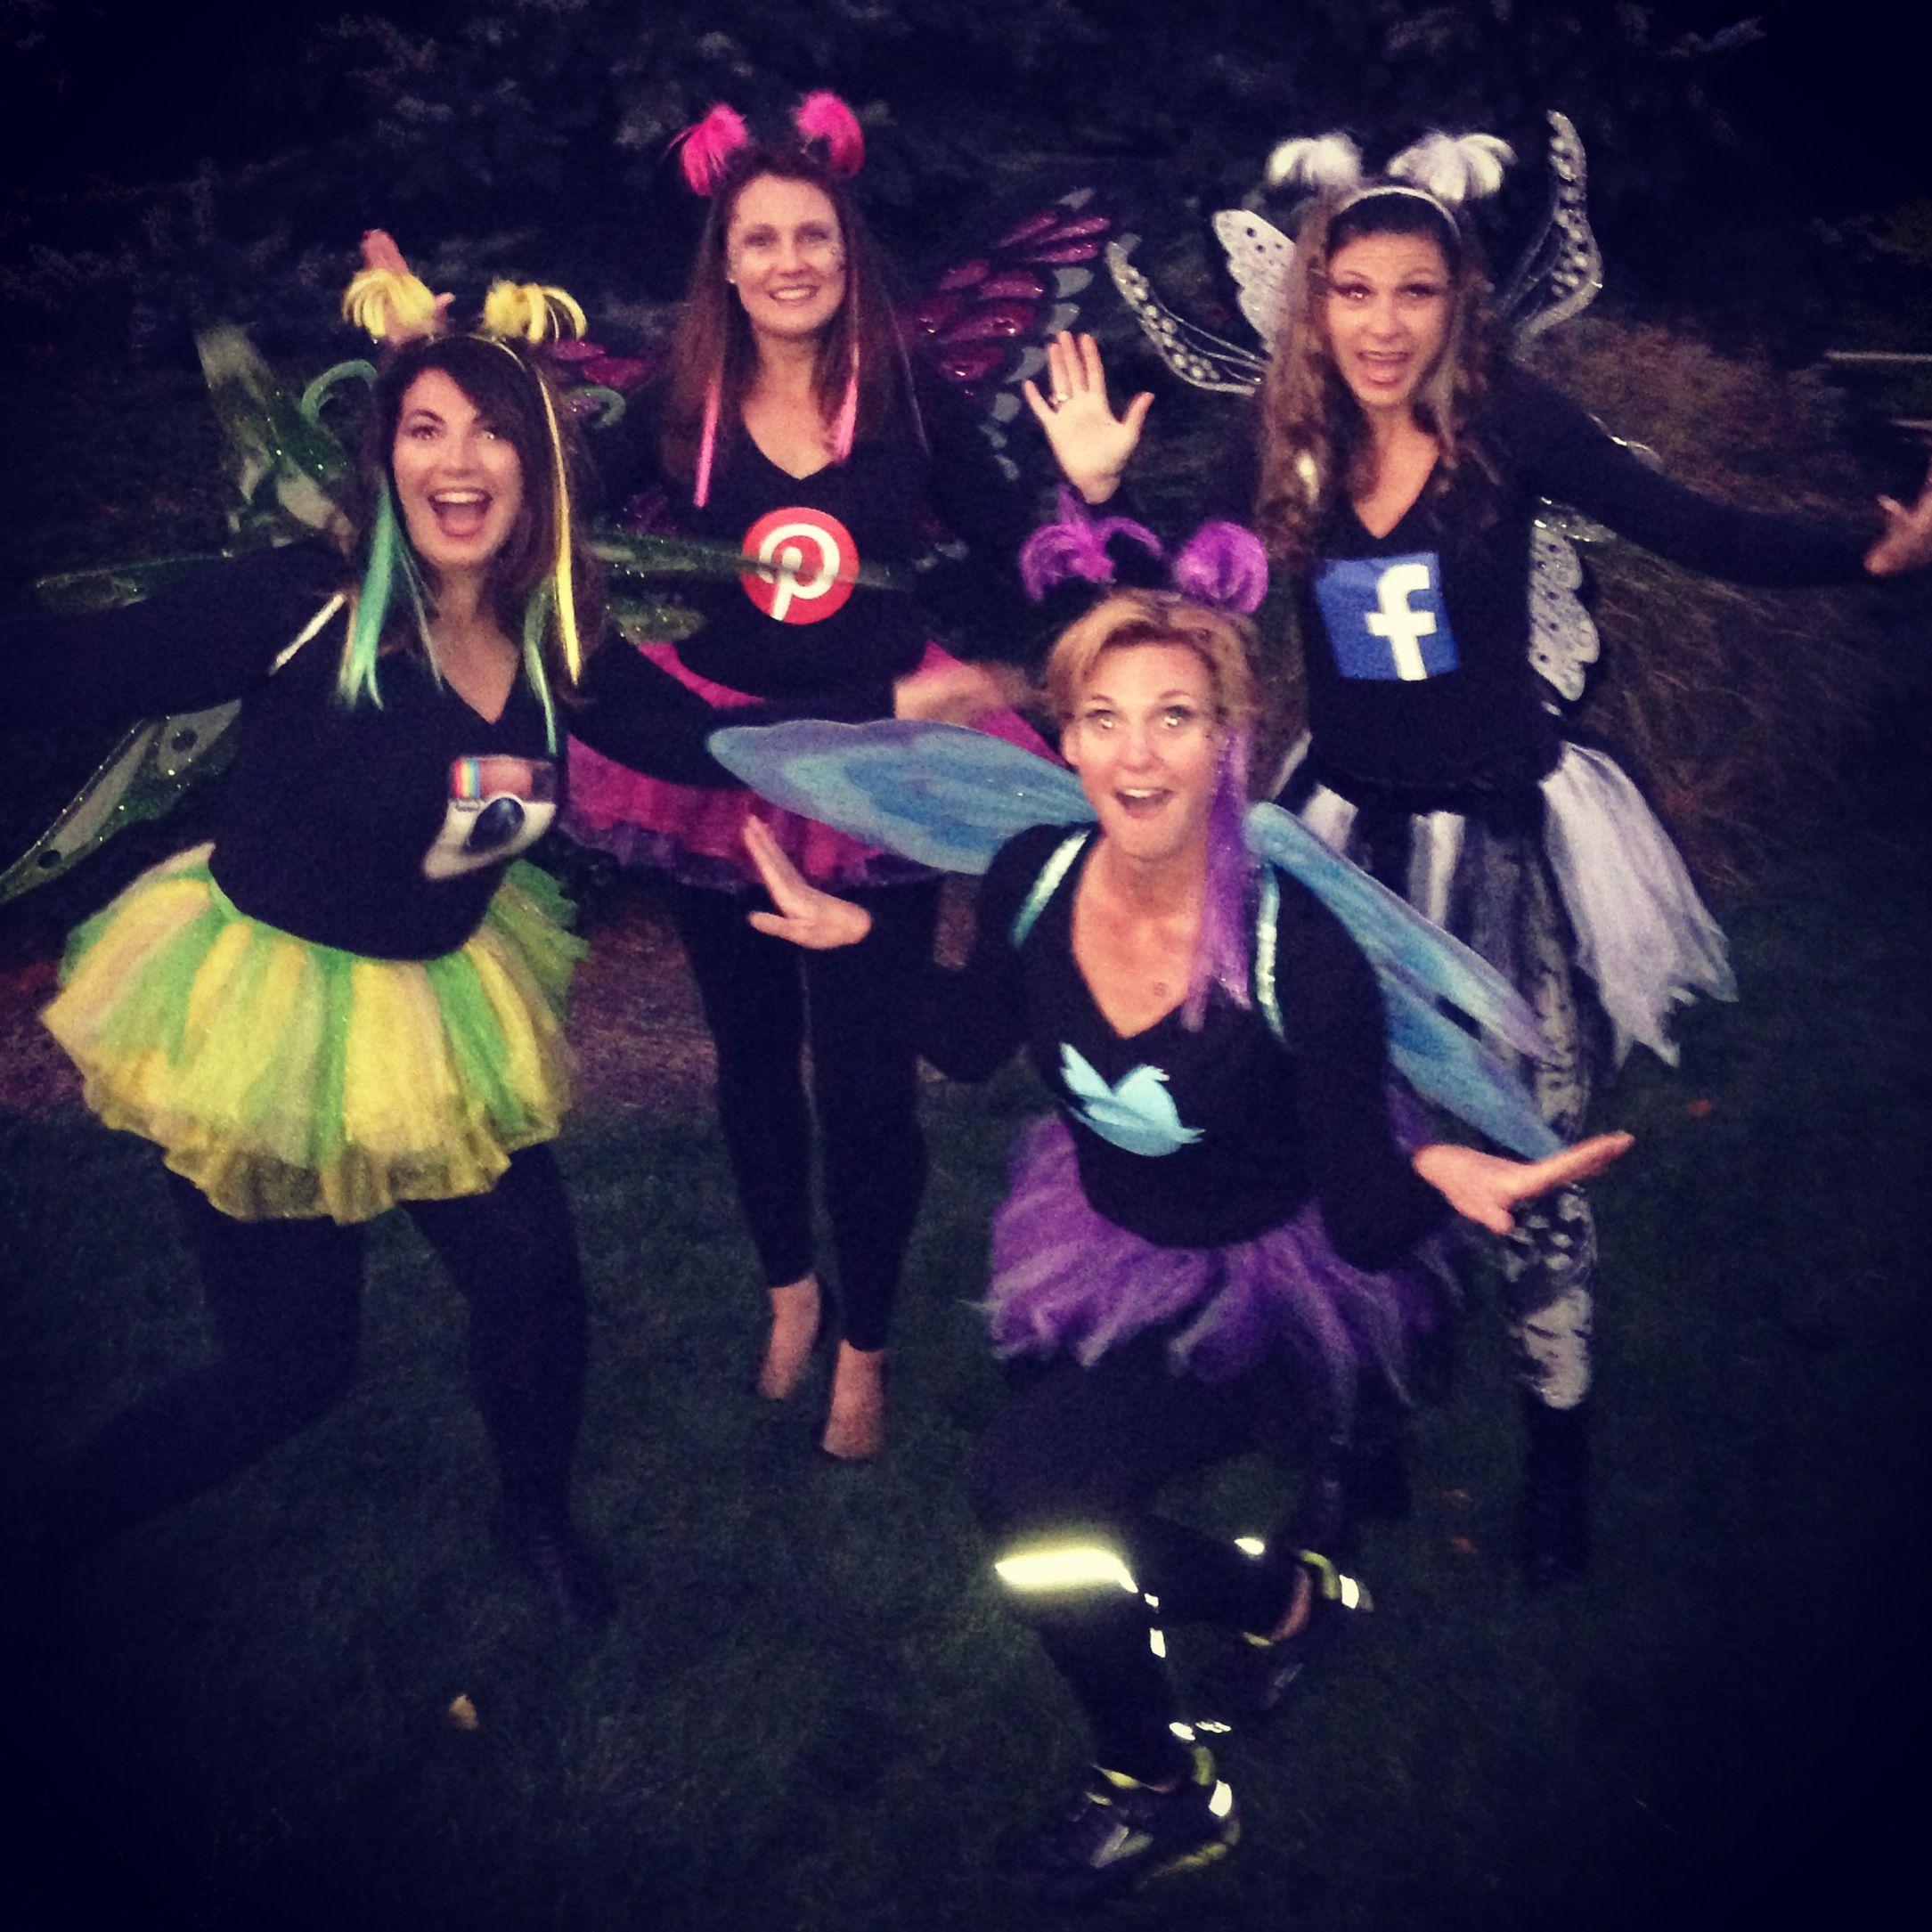 Social Butterfly Halloween Costume | holidays | Pinterest ...